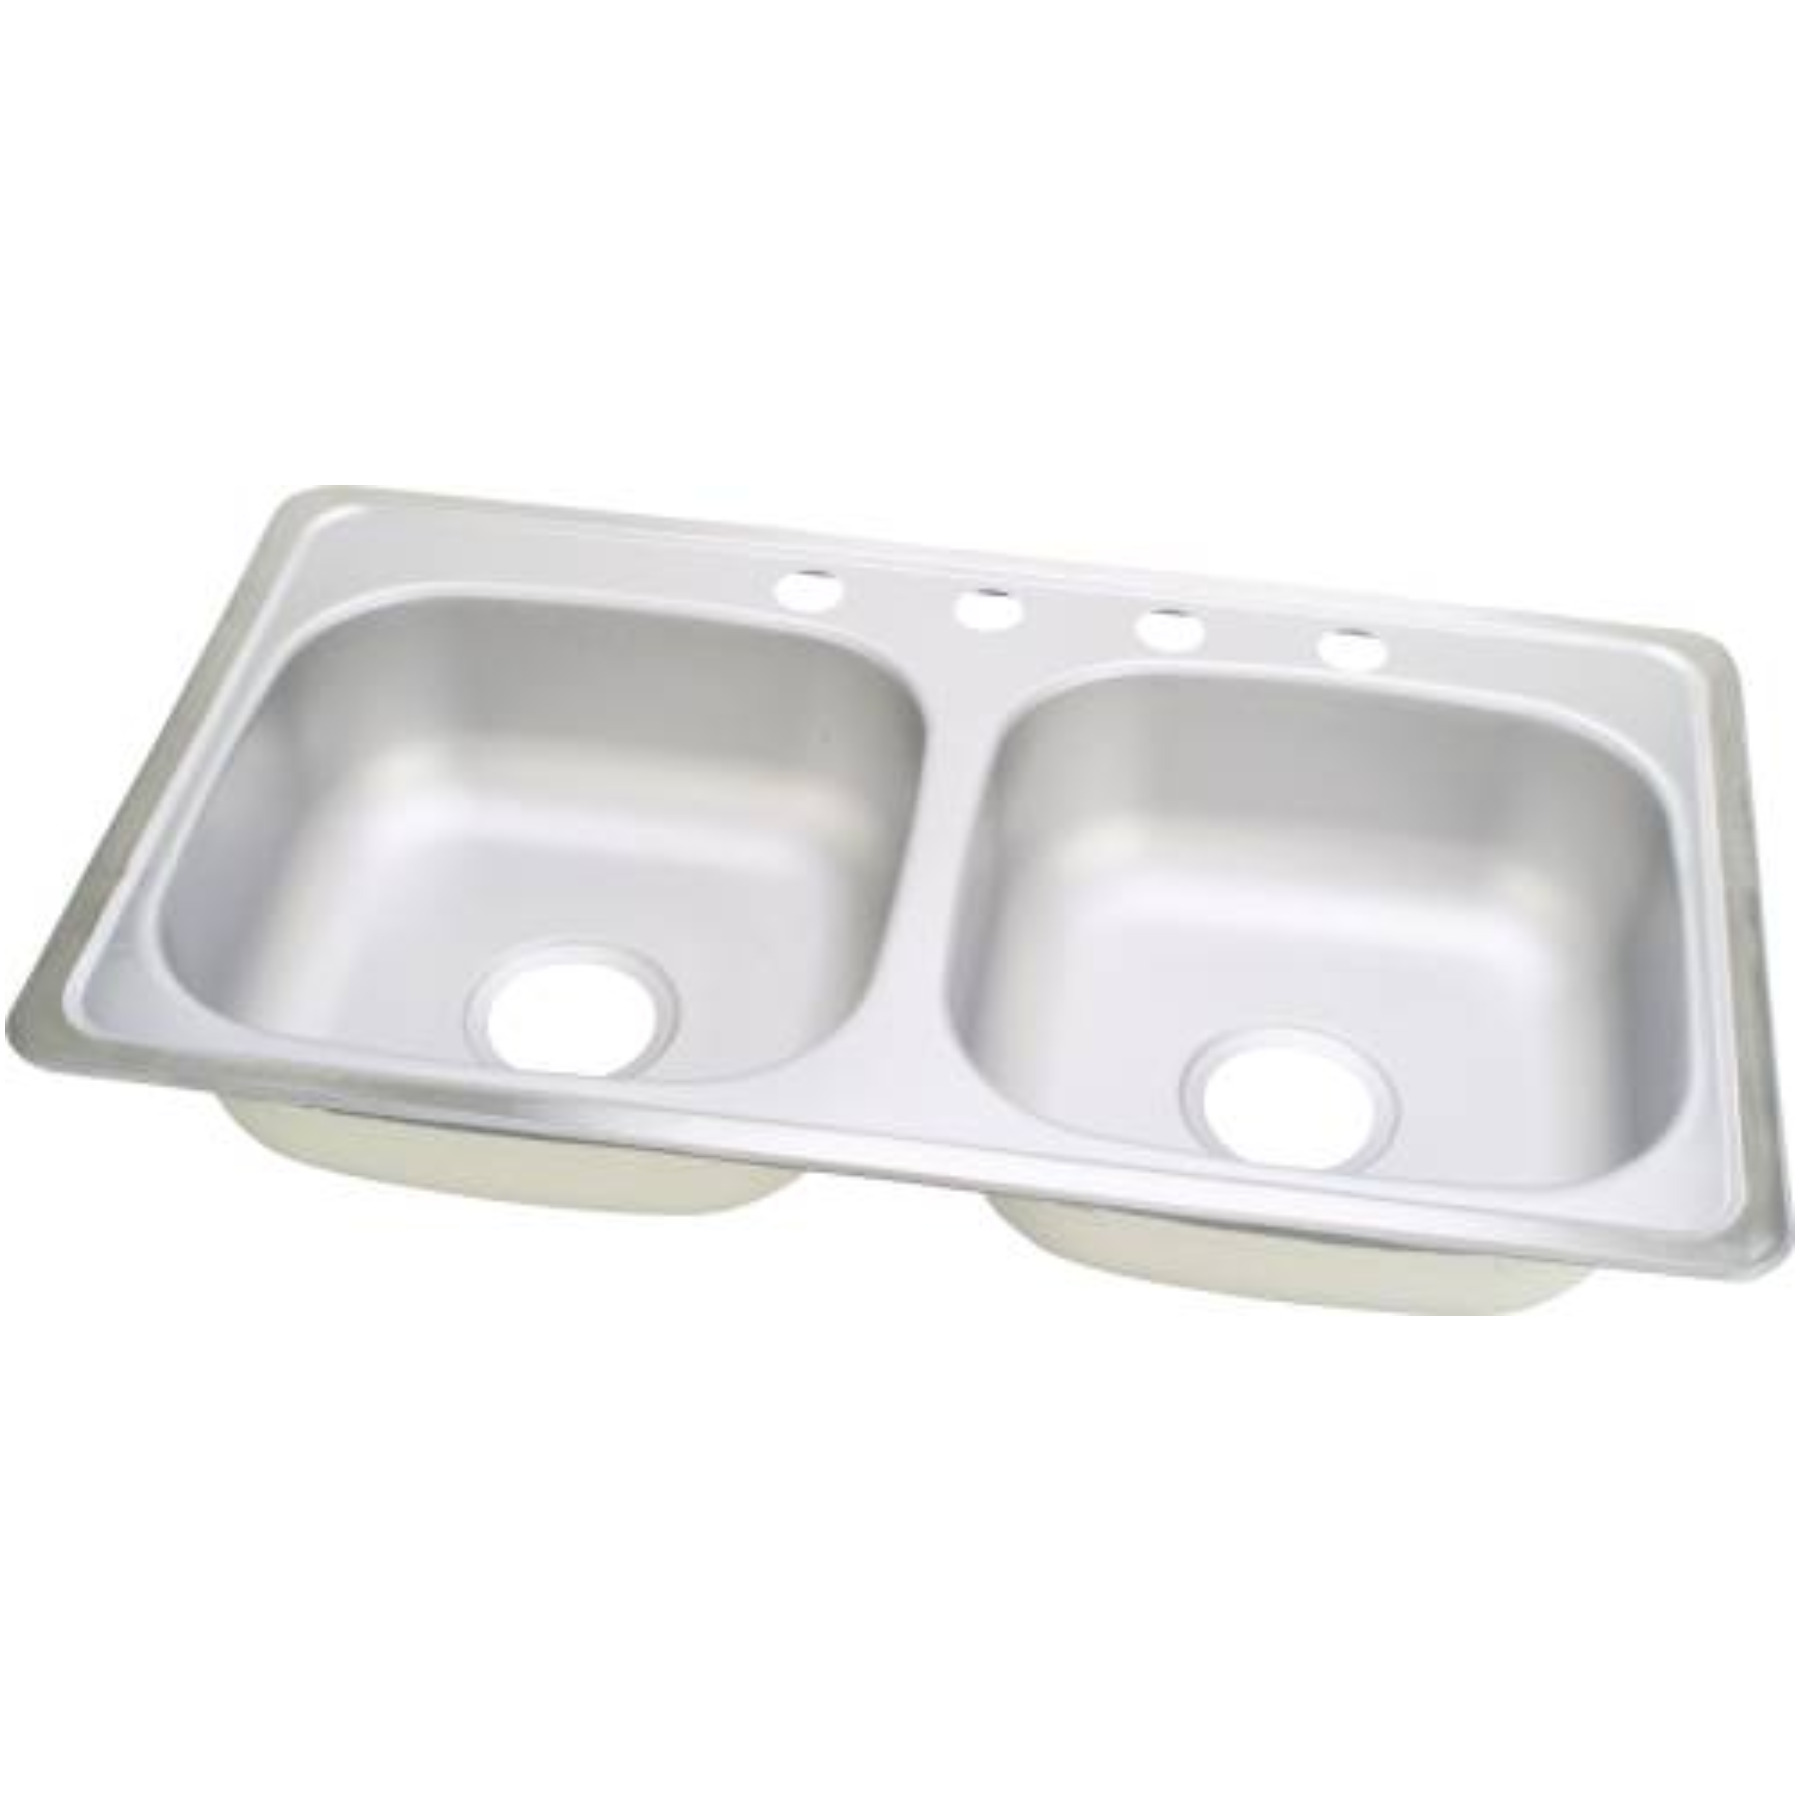 mobile home kitchen sink trailer ss walmart com